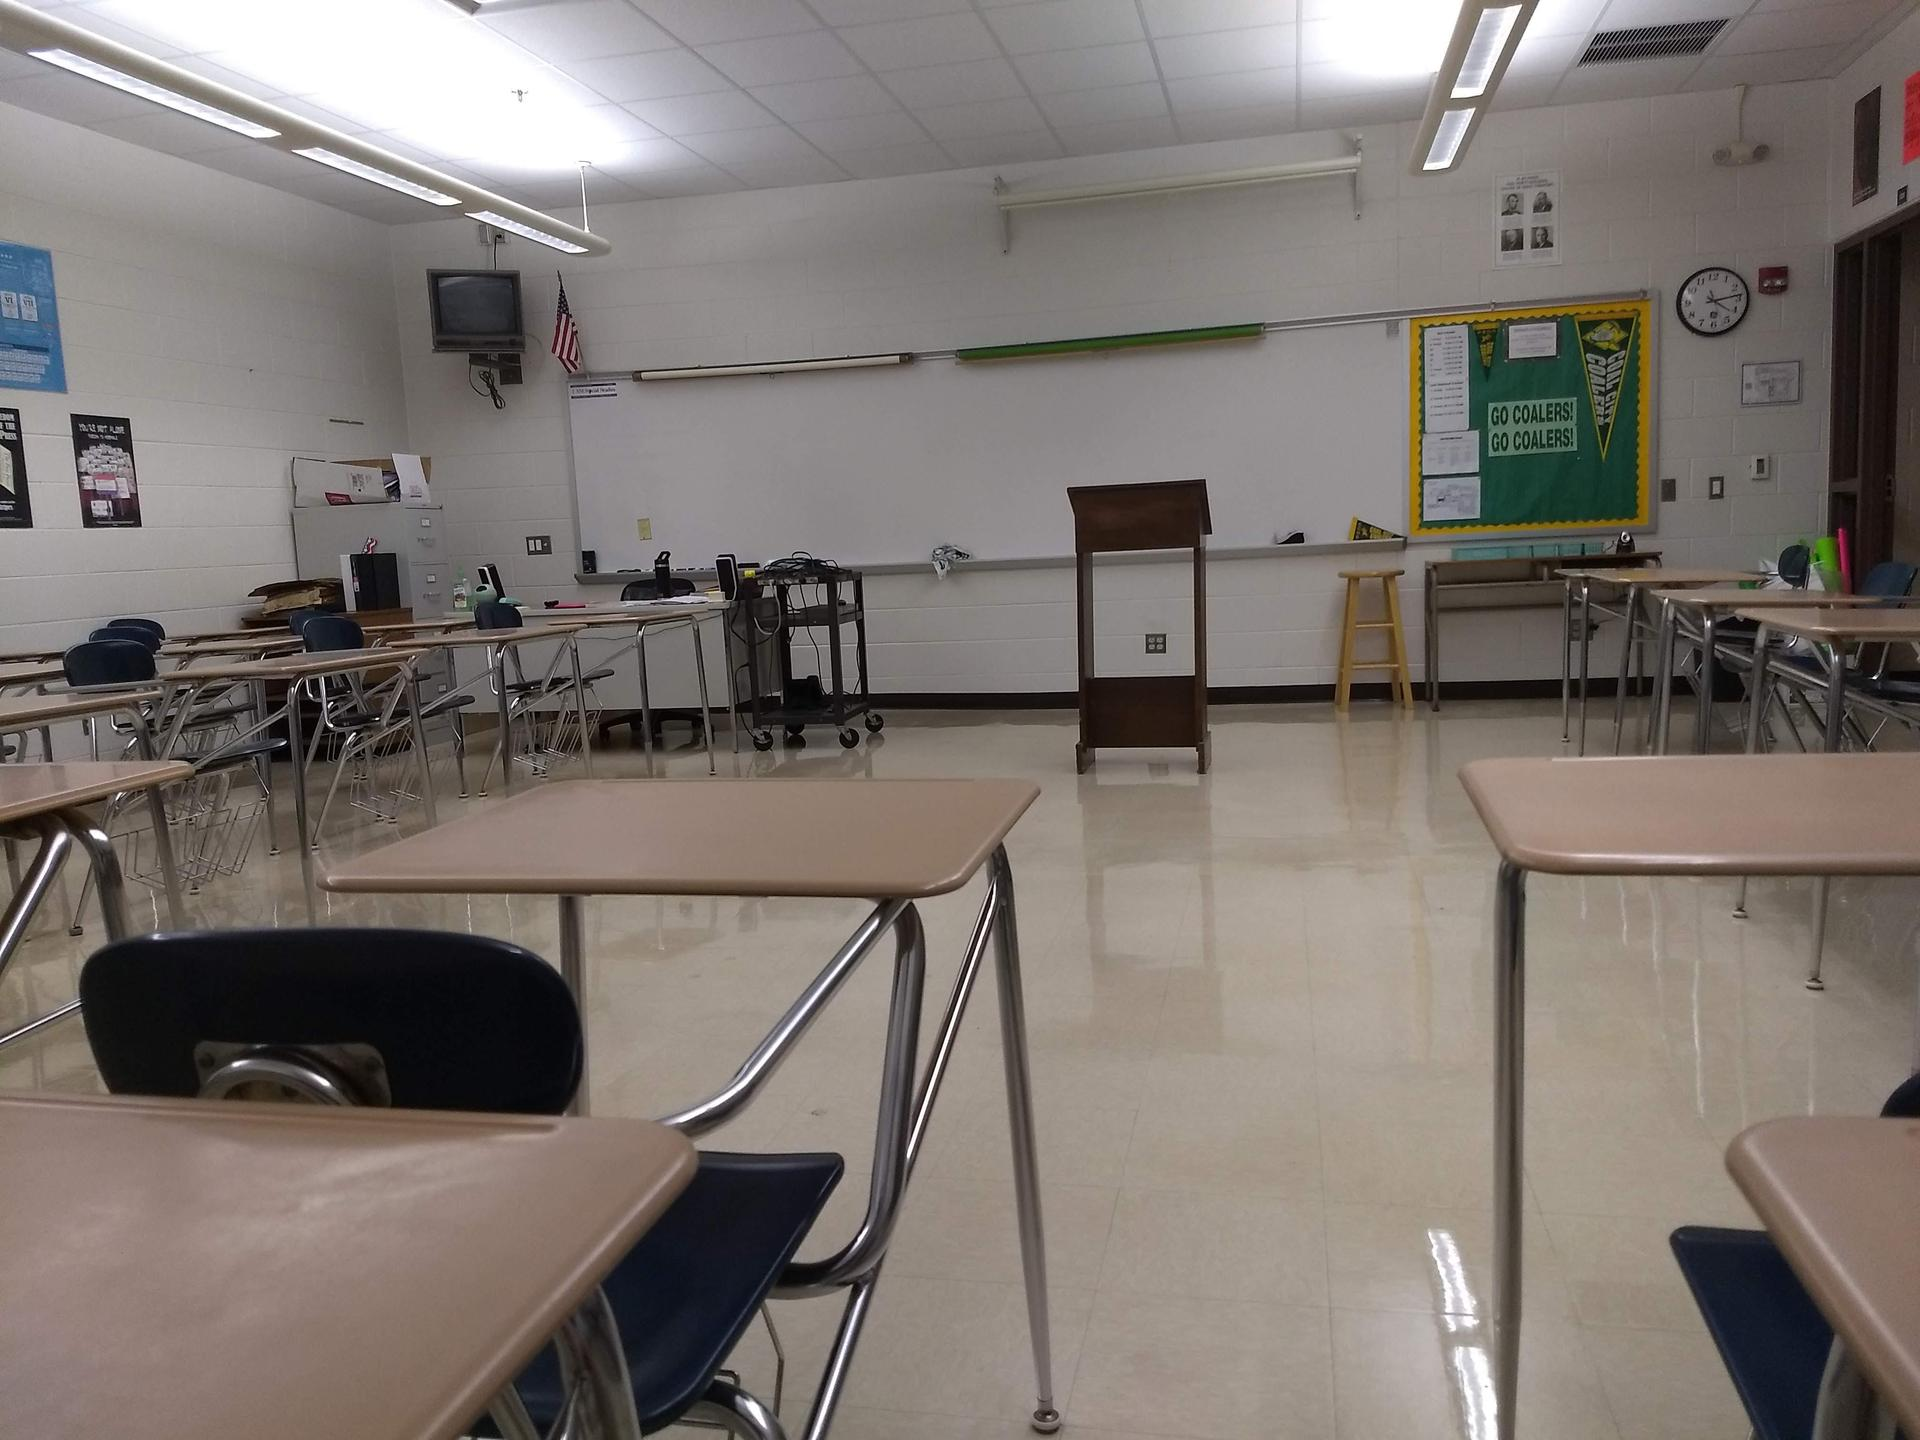 Classroom Desk View